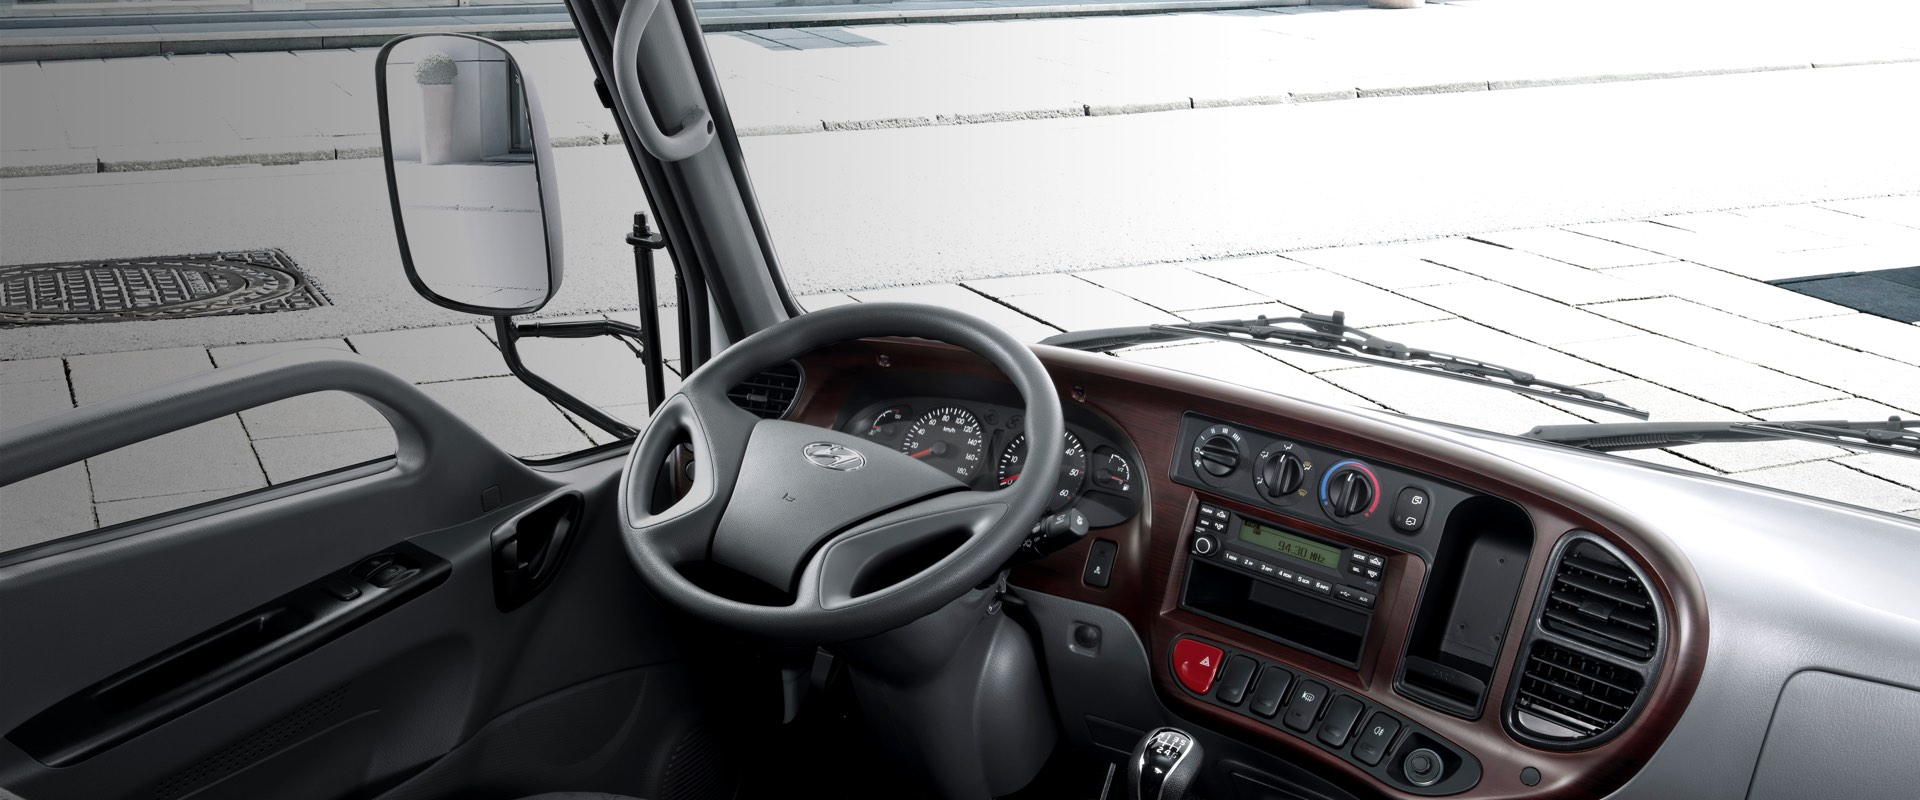 hd35city - interior 2